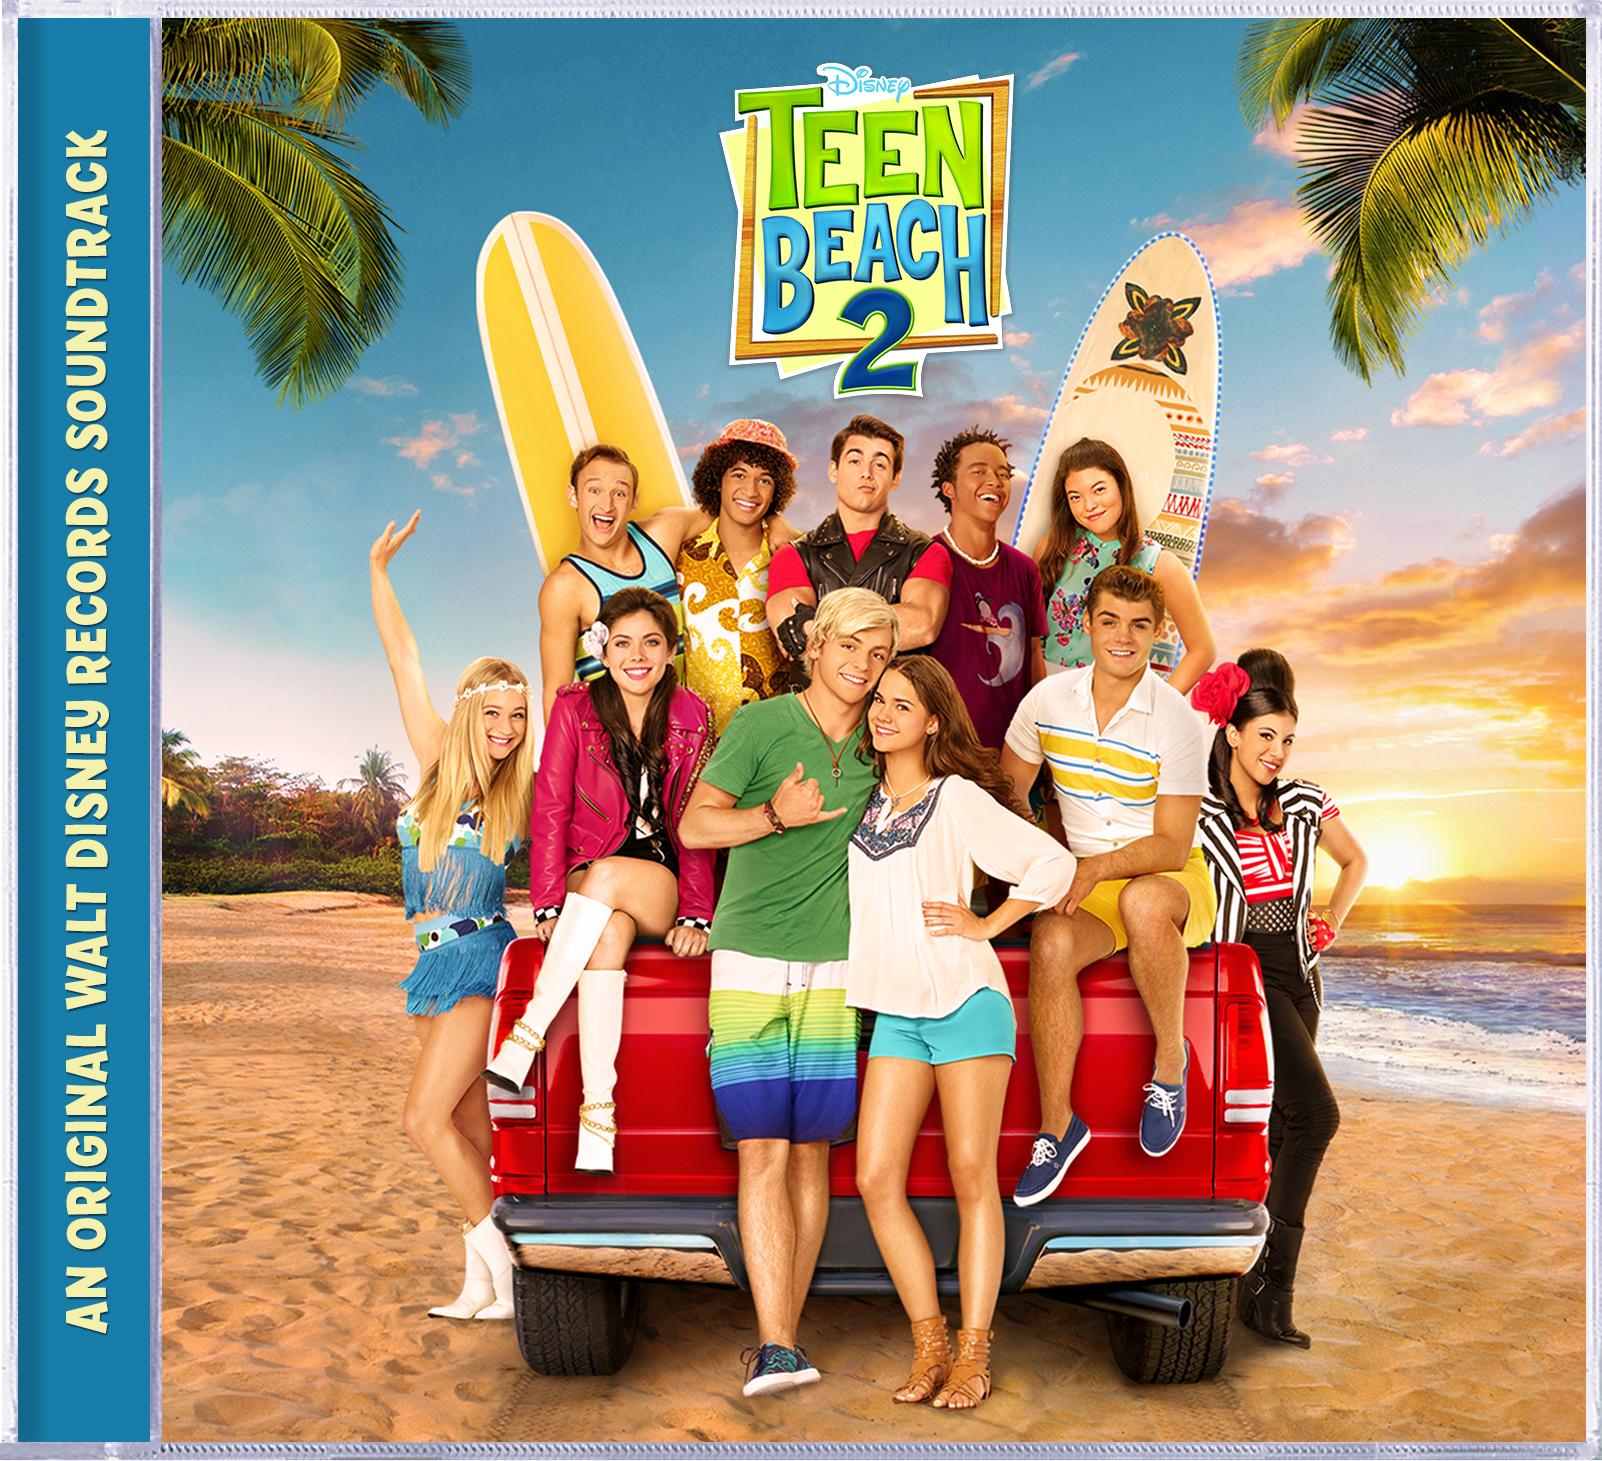 Album Review: Teen Beach 2